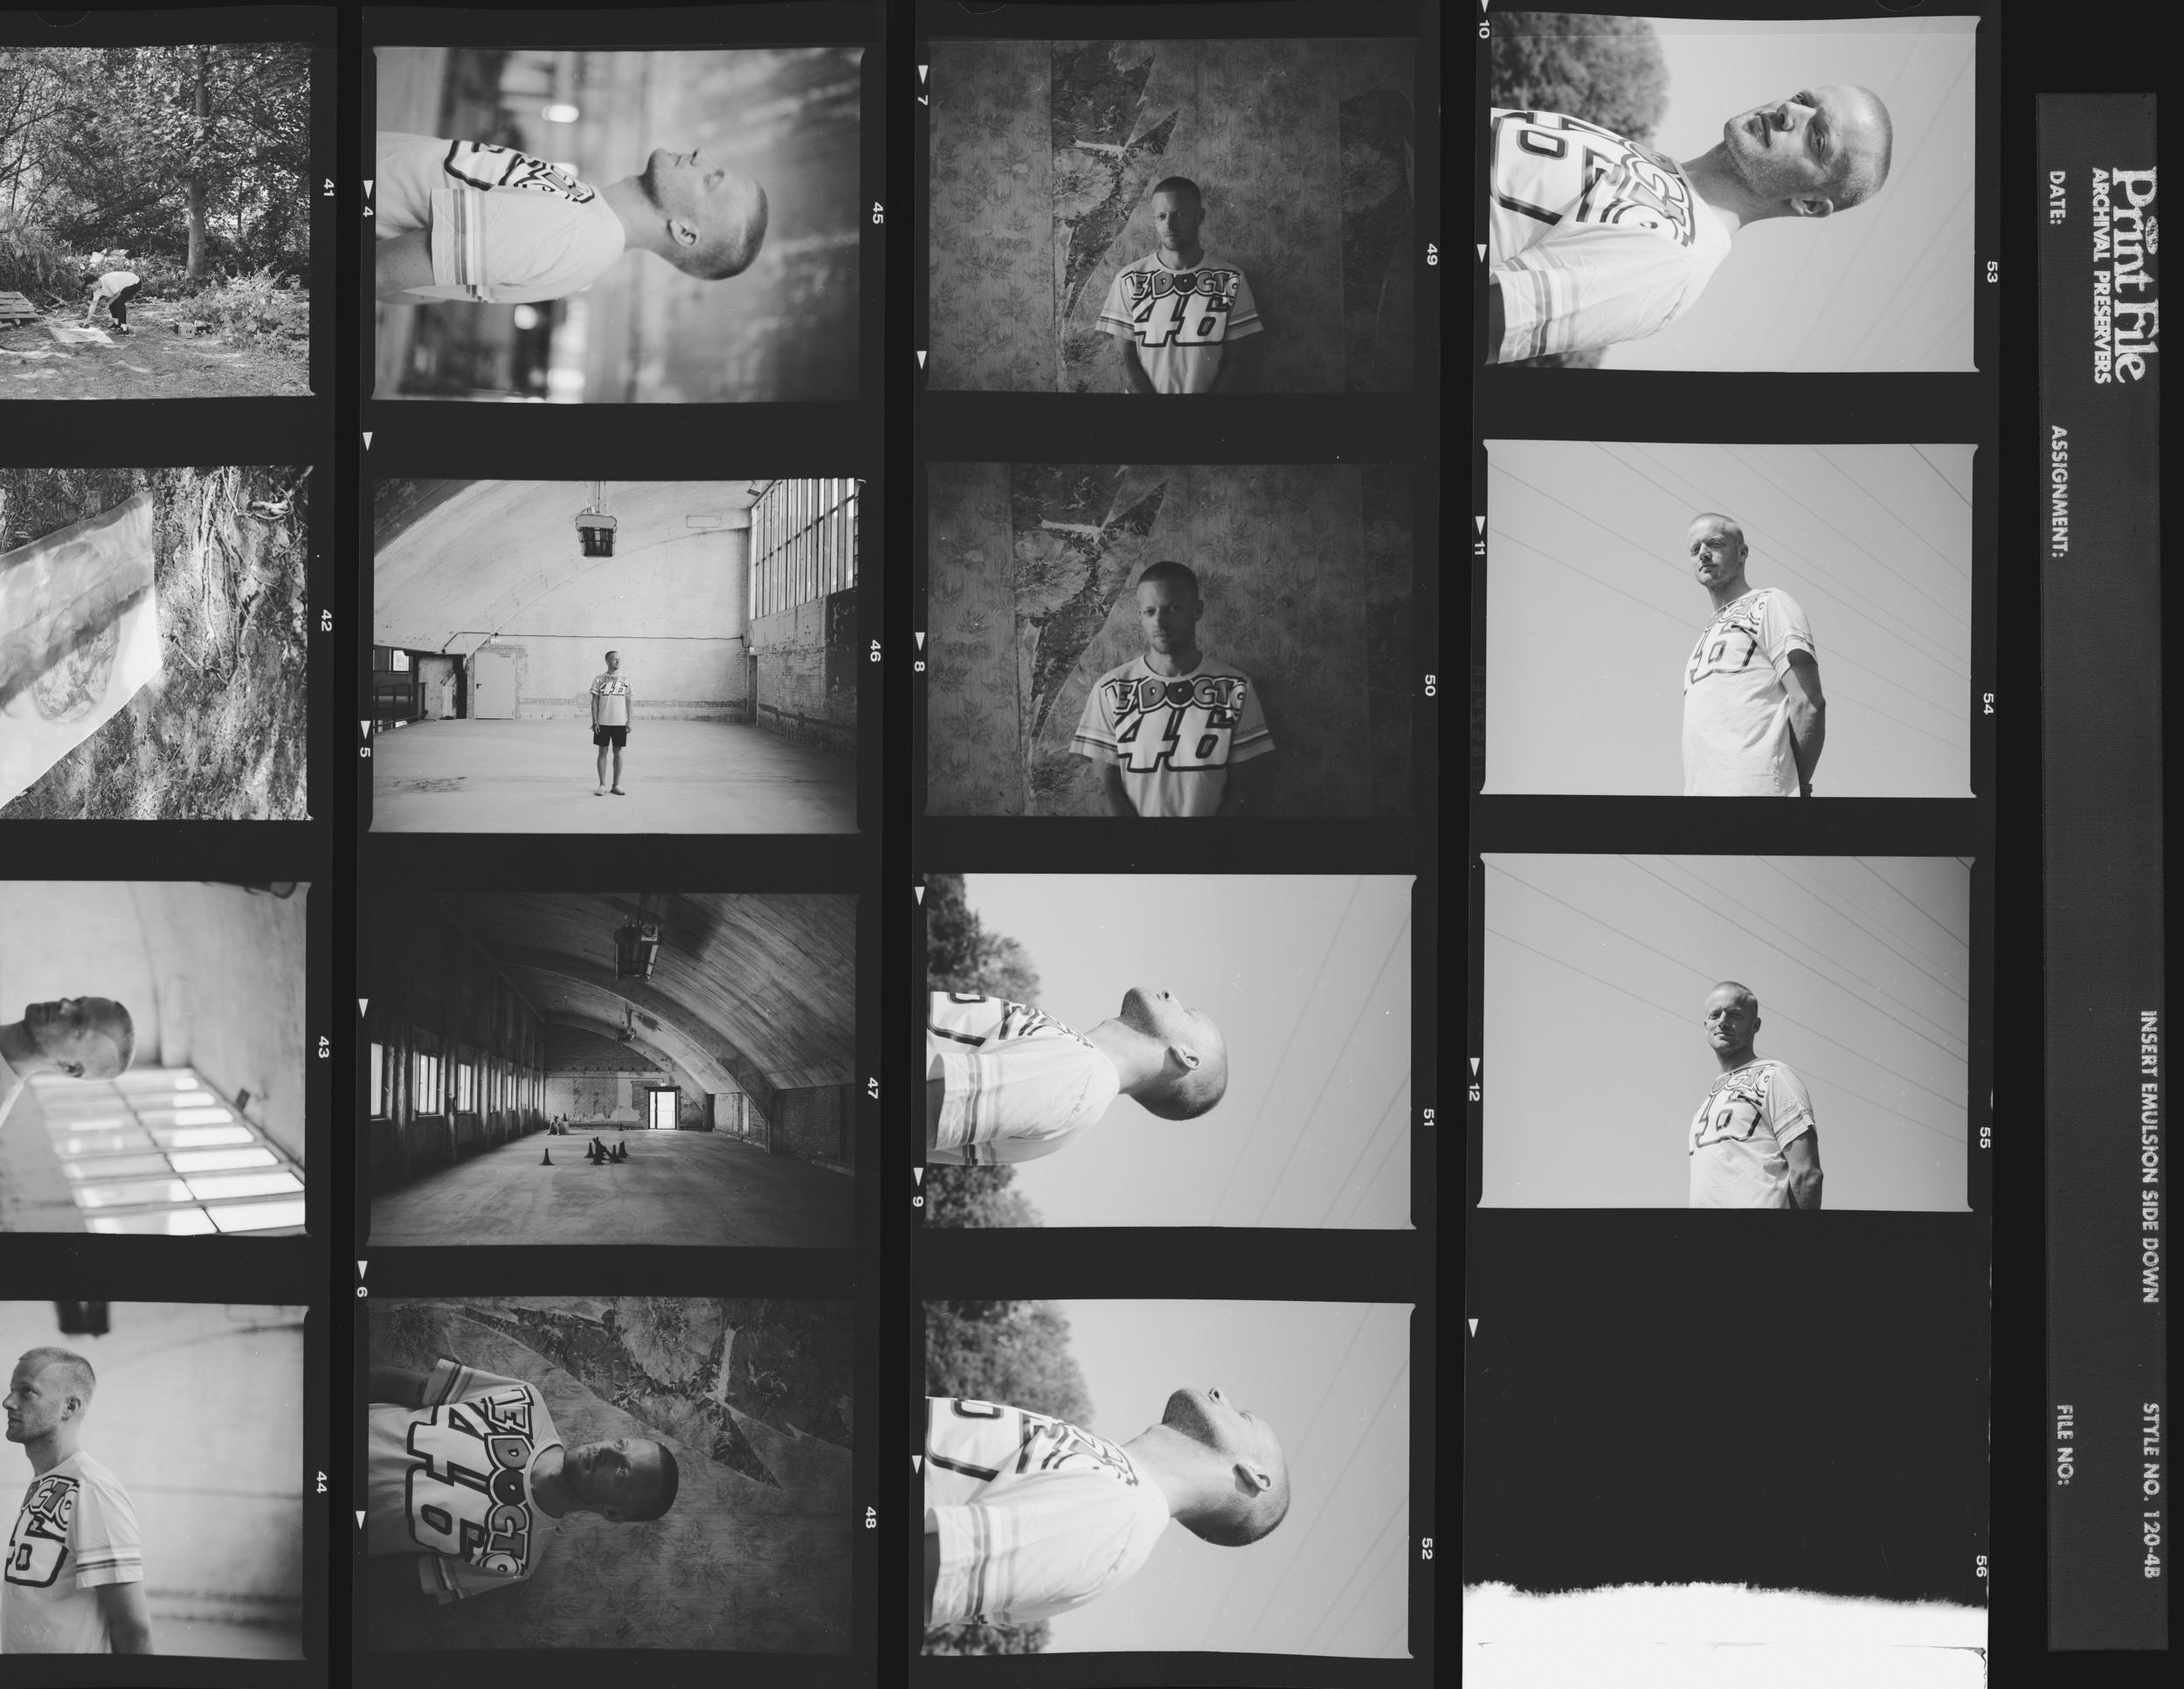 Astronautalis Web - 009.jpg